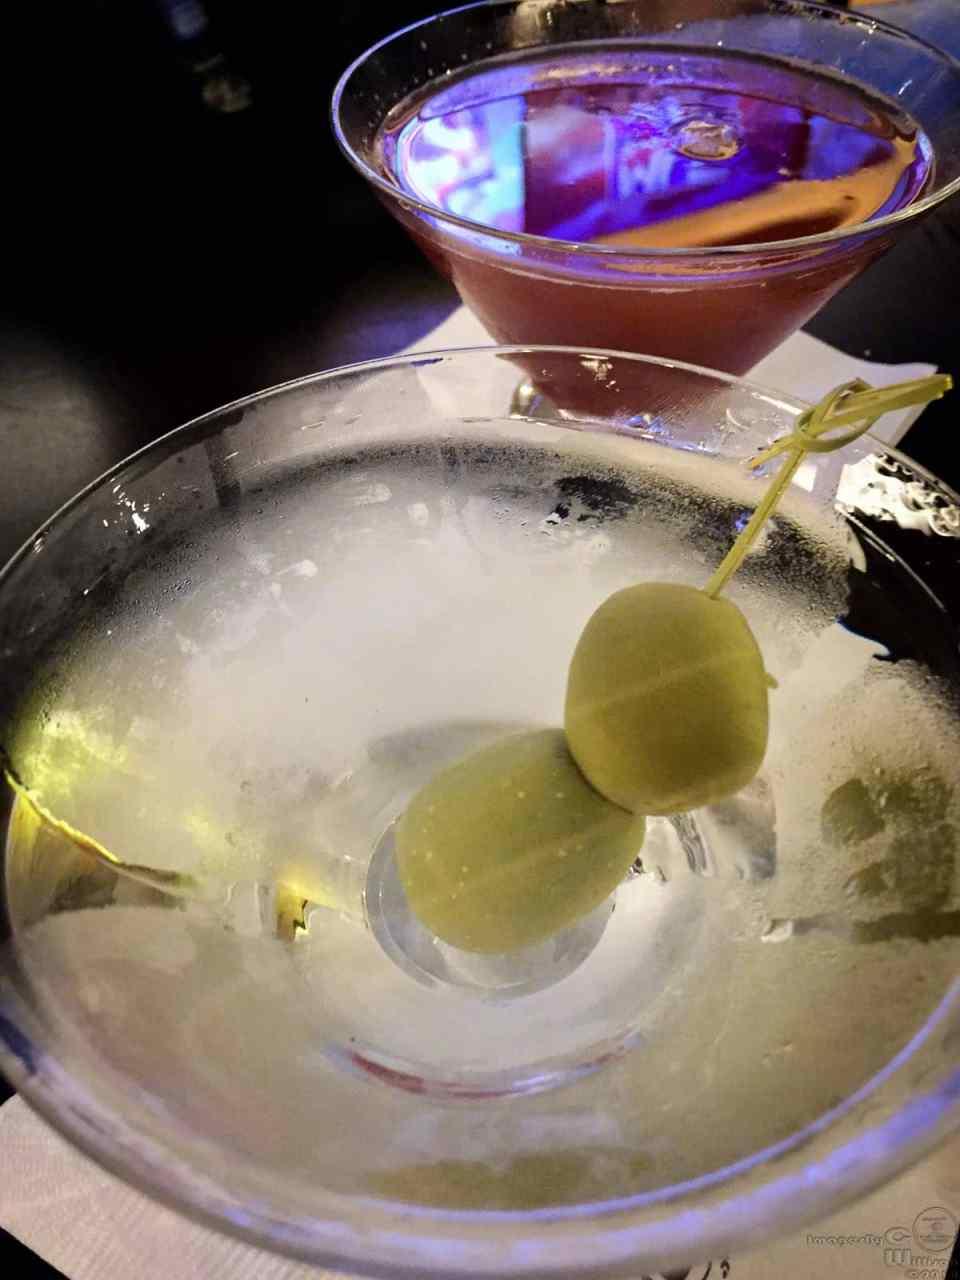 iphone, martini, vodka, olives